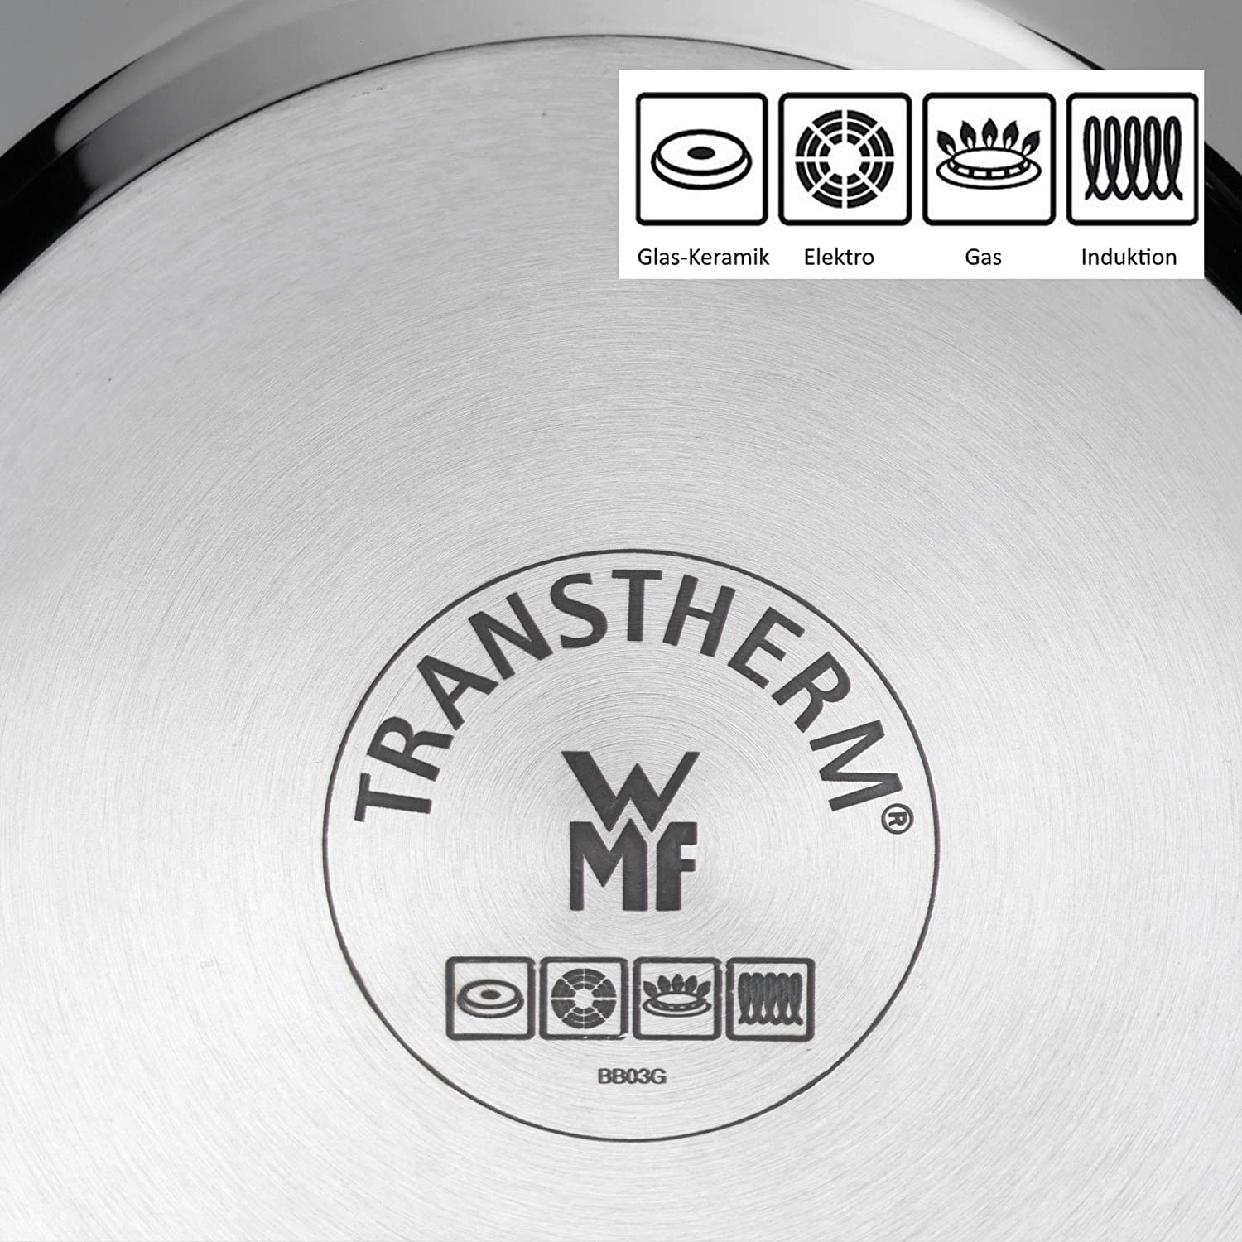 WMF(ヴェーエムエフ) パーフェクト プラス 圧力鍋の商品画像6